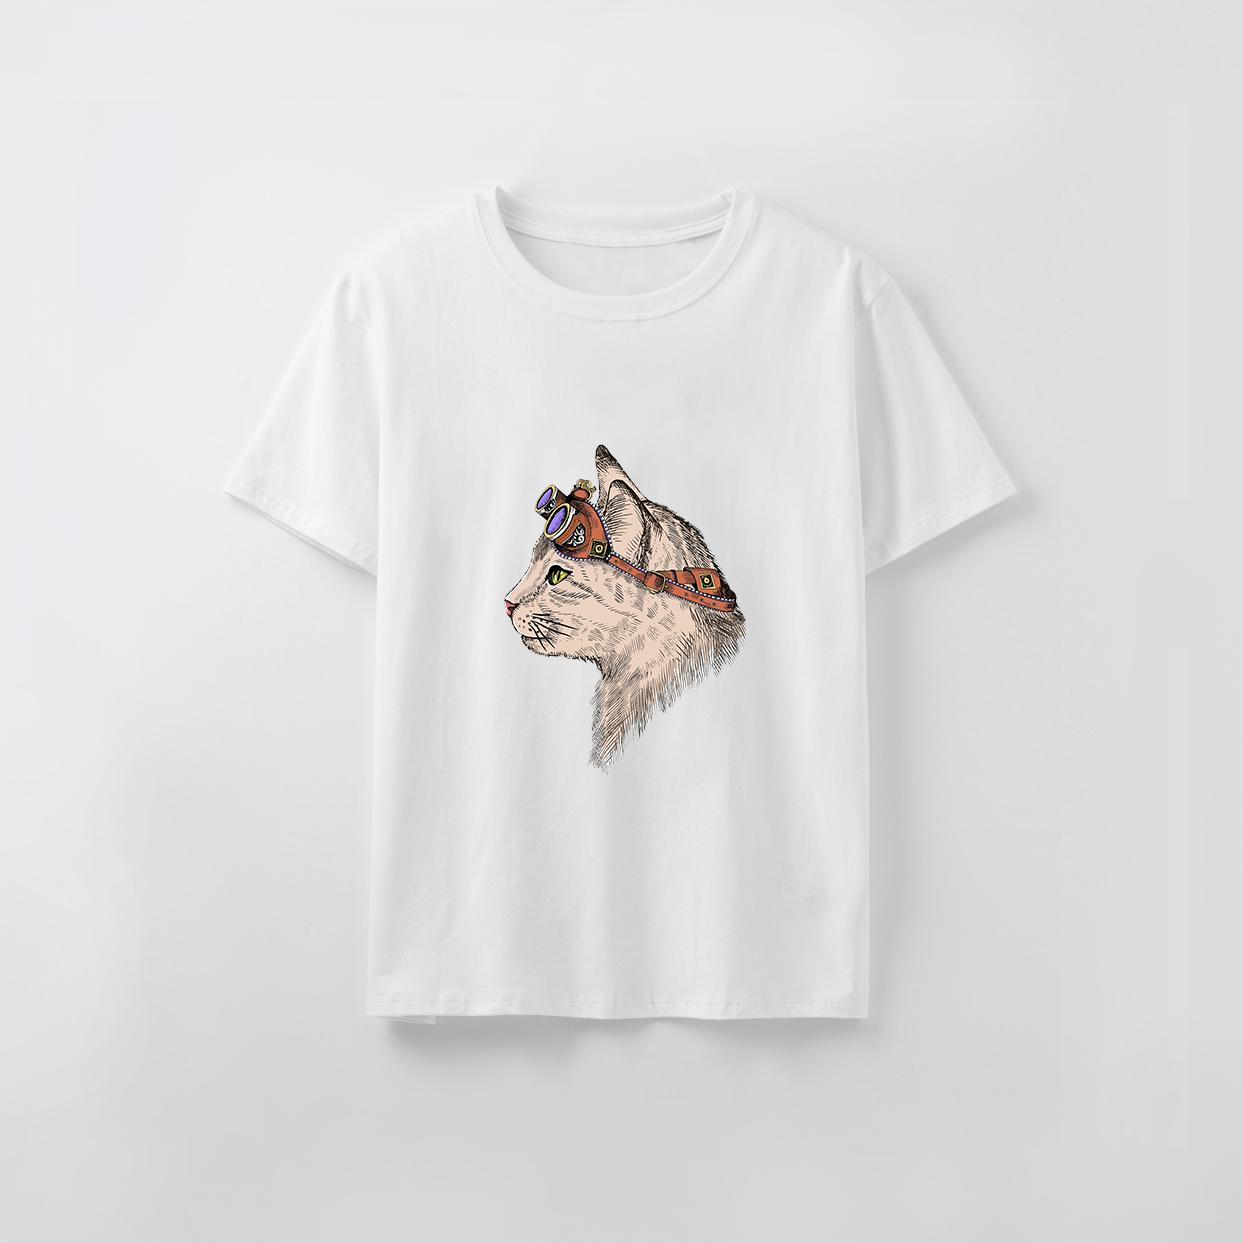 2020 Custom Print T-shirt 100% Cotton Design Mens Womens Pure Color Round Neck Short-Sleeved Logo Free DIY Printed Tshirt 2091205Q